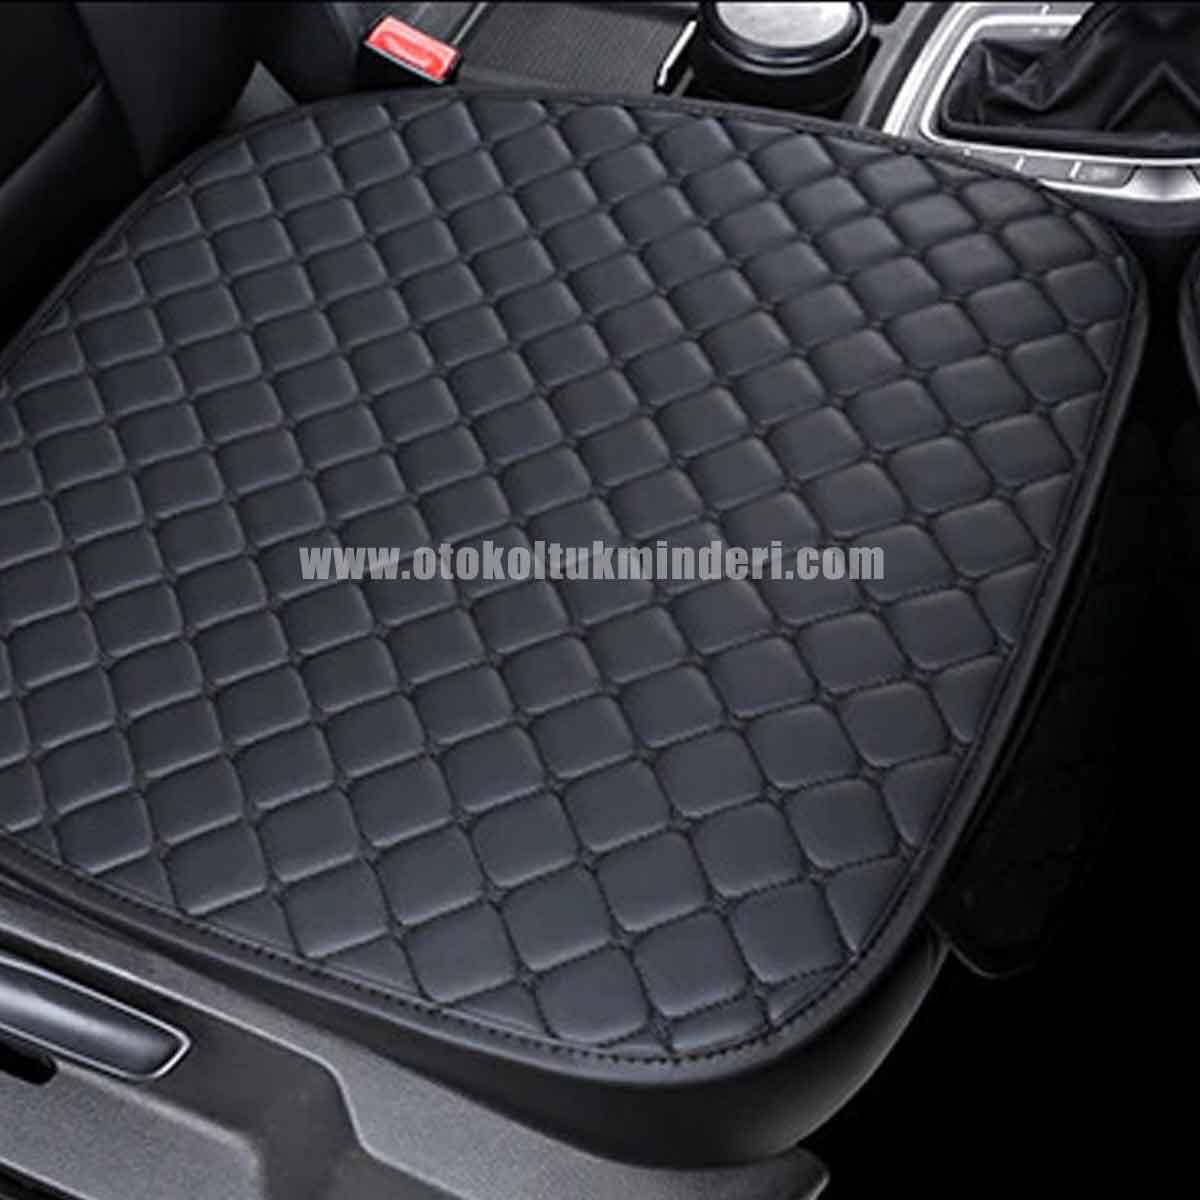 Land Rover oto koltuk kılıfı - Land Rover Koltuk minderi Siyah Deri Cepli